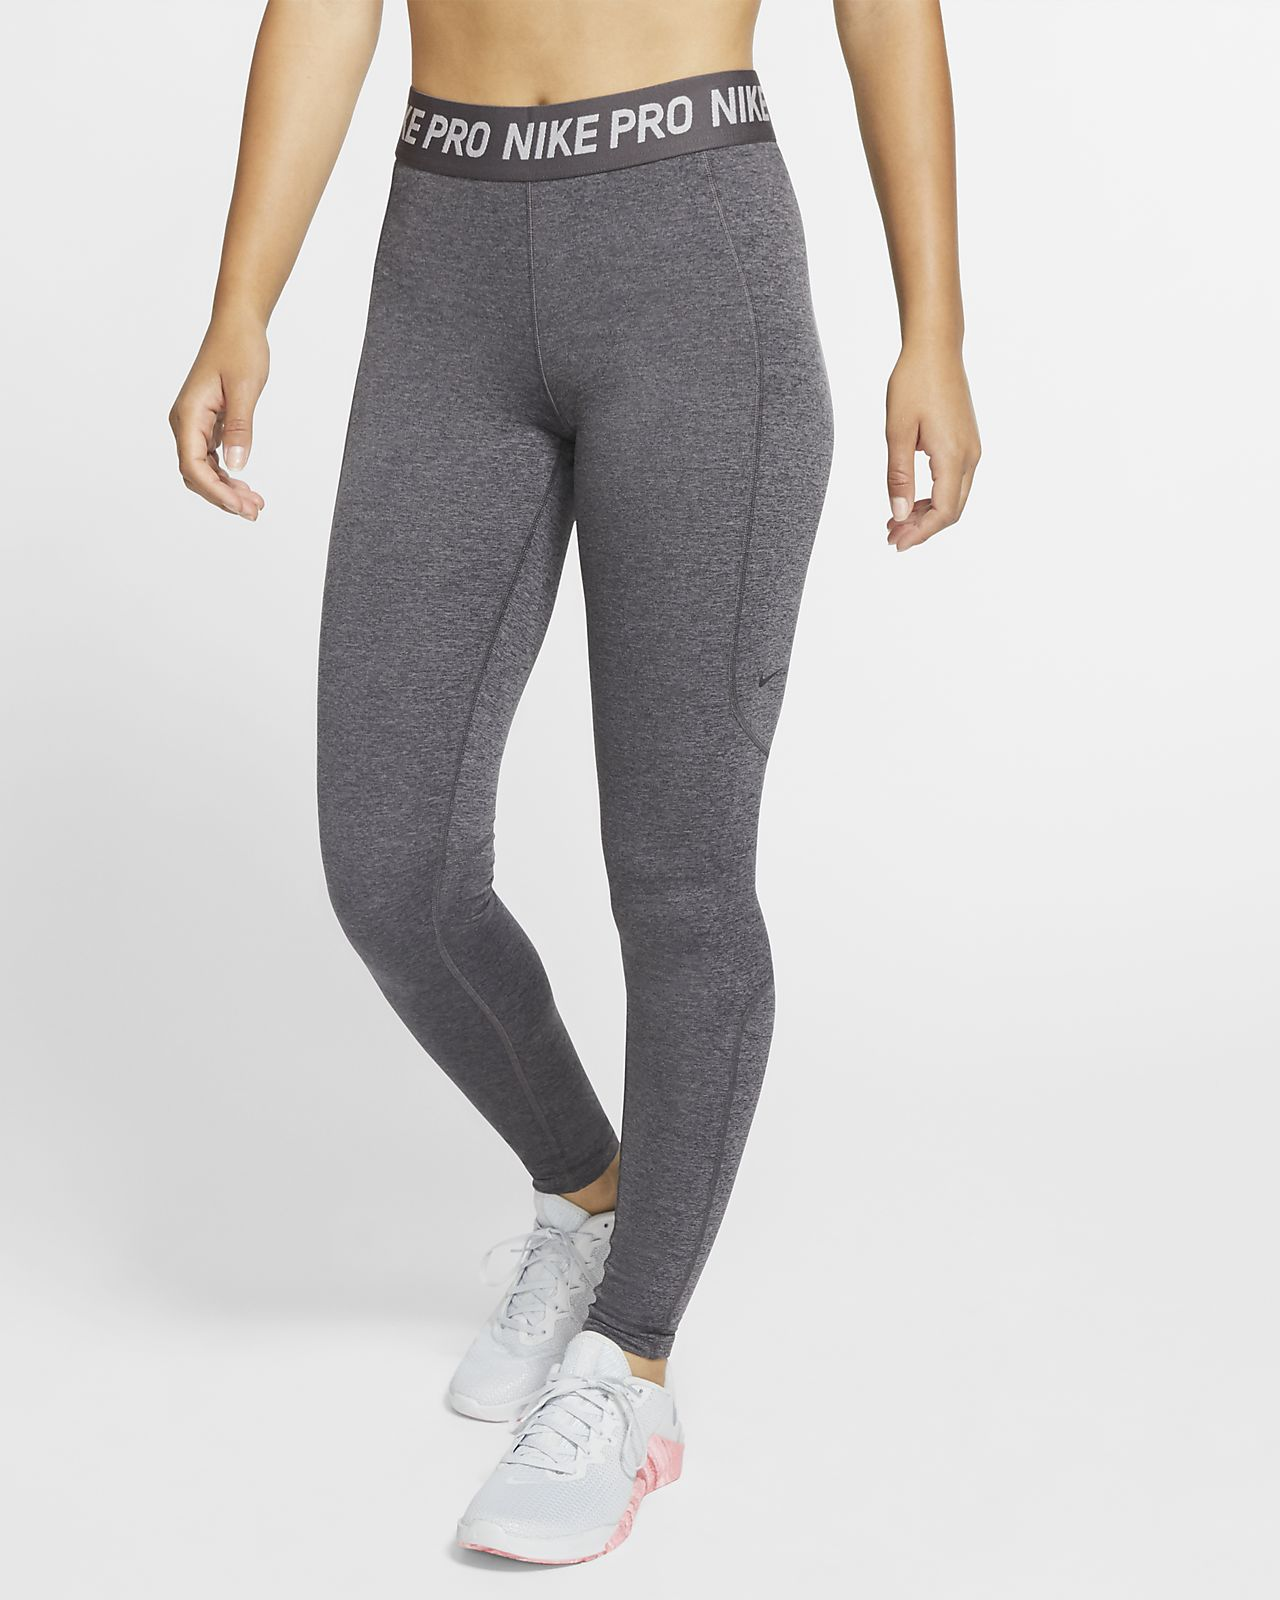 Nike Pro Warm 女子训练紧身裤